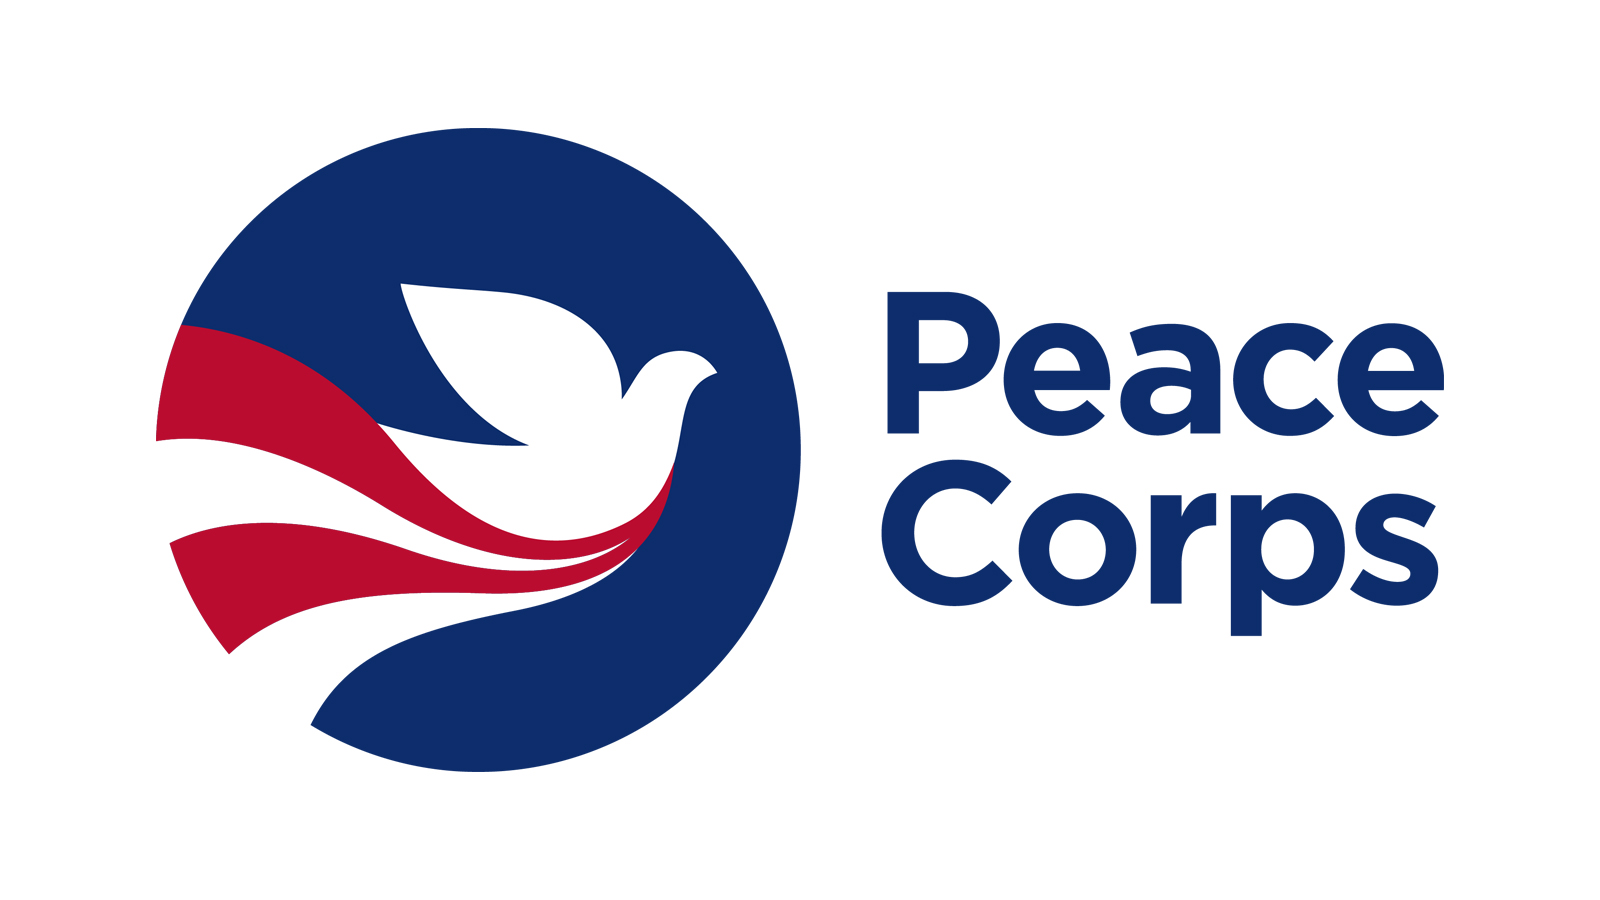 The Peace Corps logo.